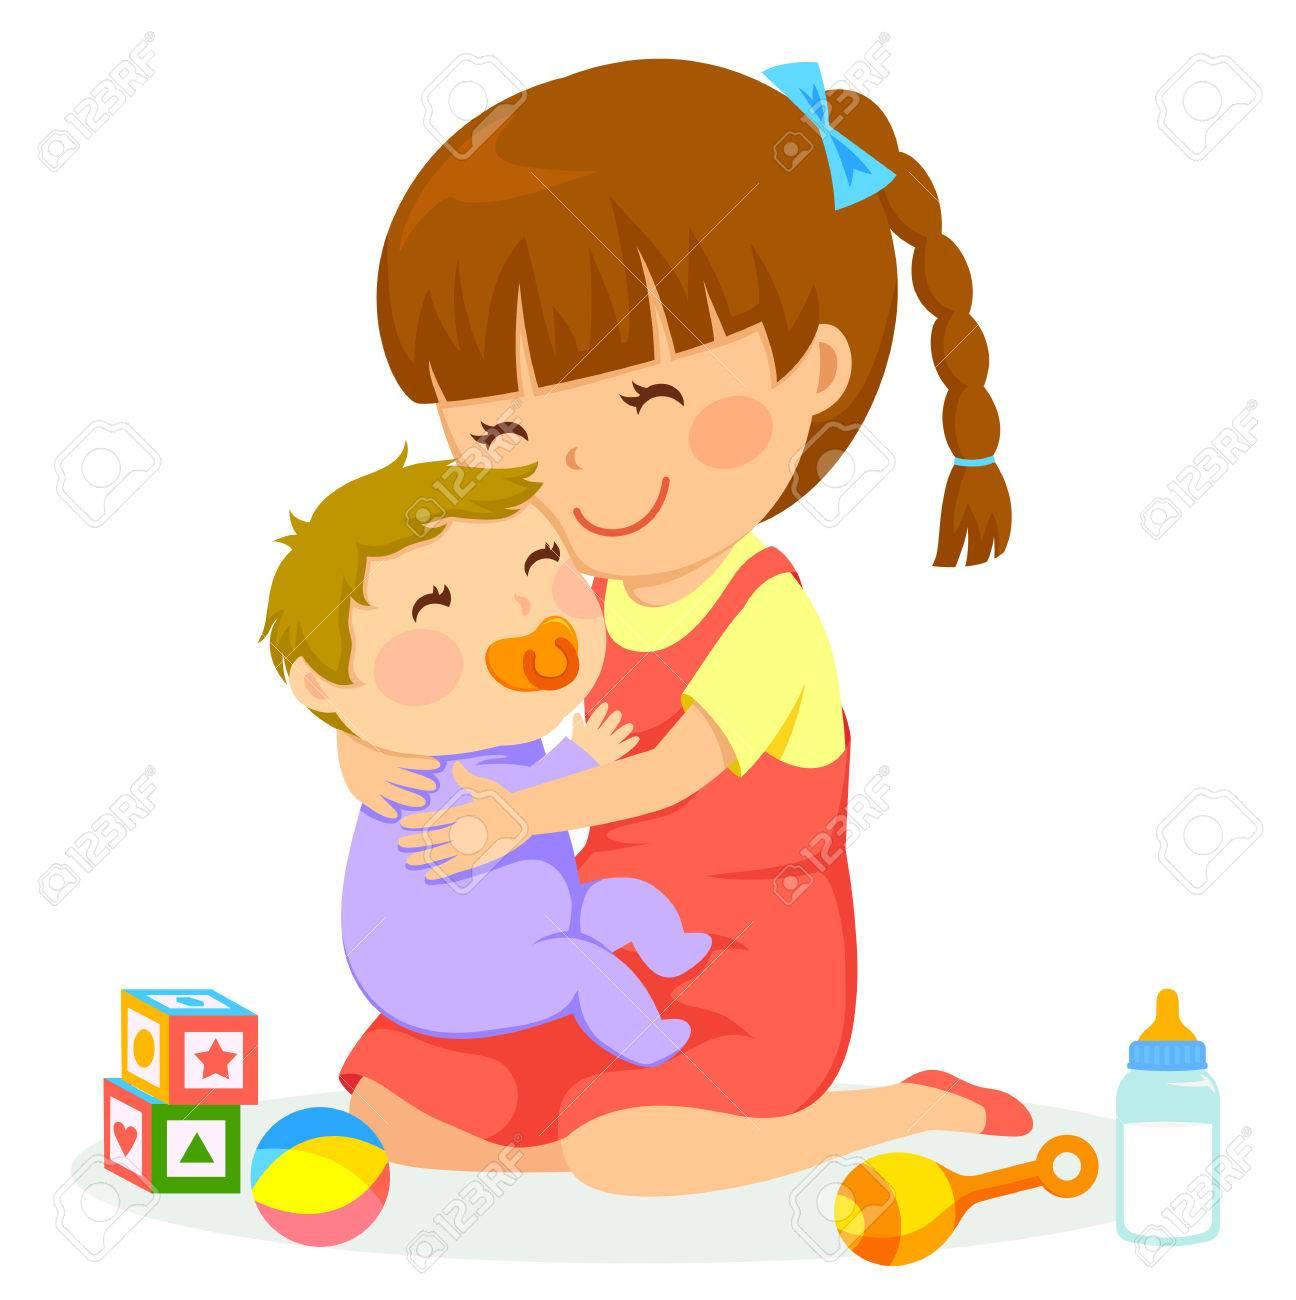 little girl hugging a baby - 69685965